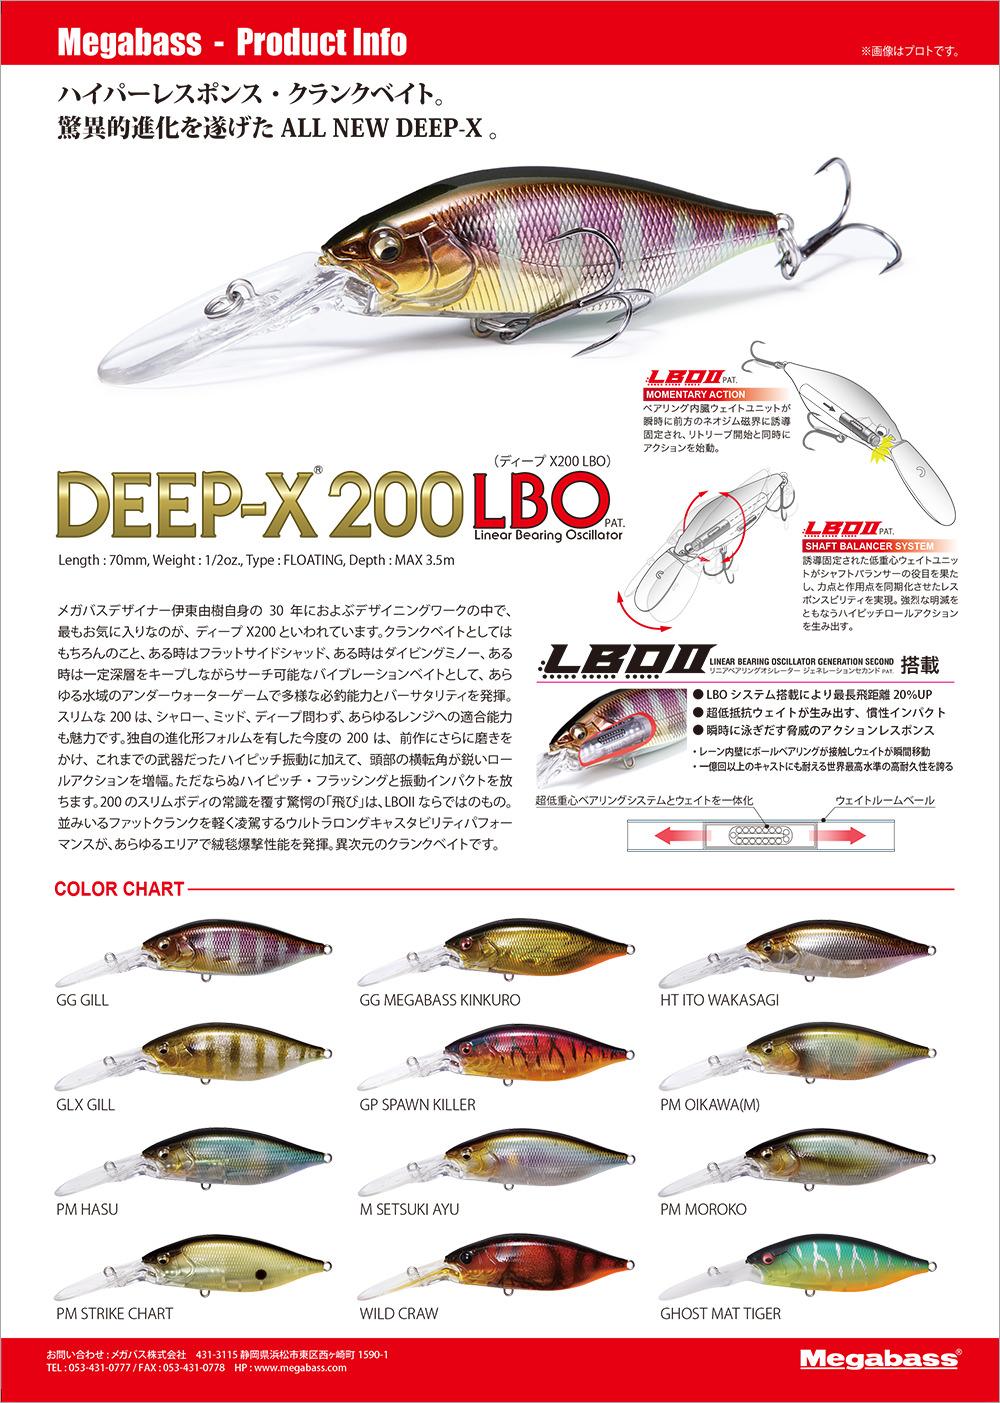 DEEP-X200 LBO